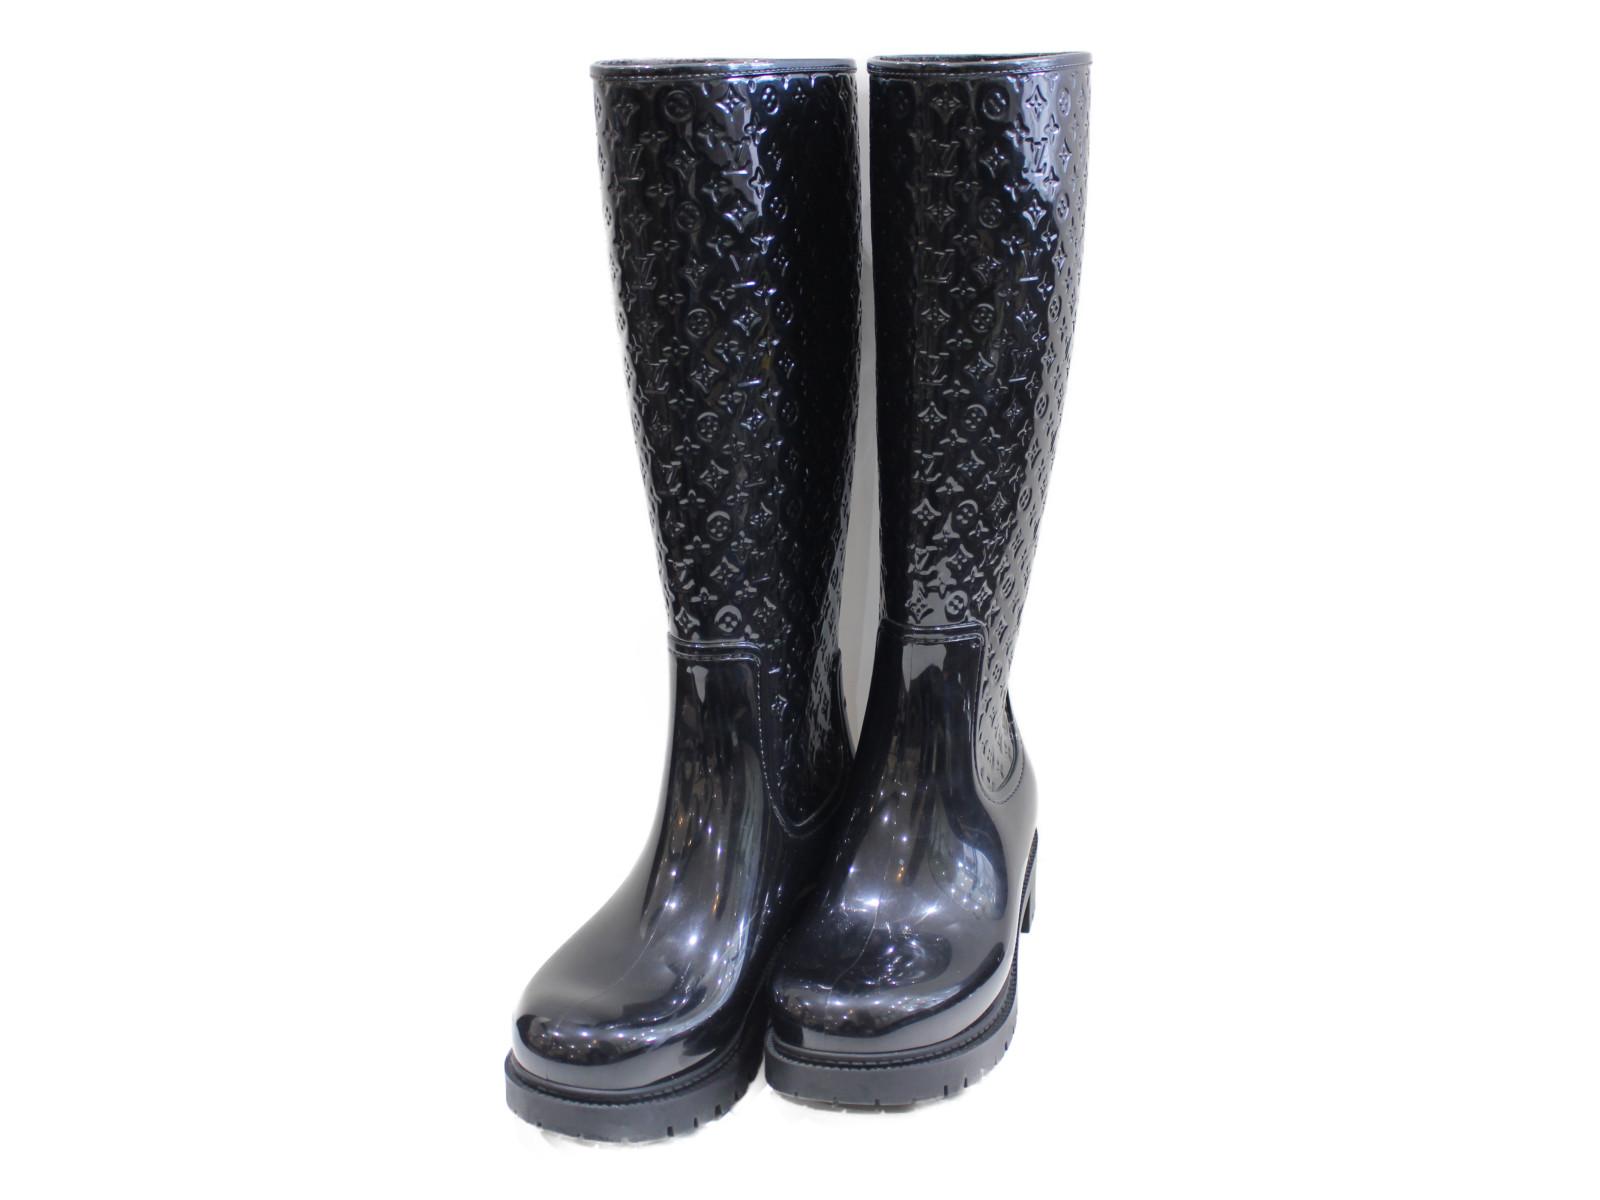 LOUIS VUITTON 靴レインブーツスプラッシュ 35XT6R1BG0 ブラック 約22cmシンプル レディース オシャレプレゼント包装可【中古】